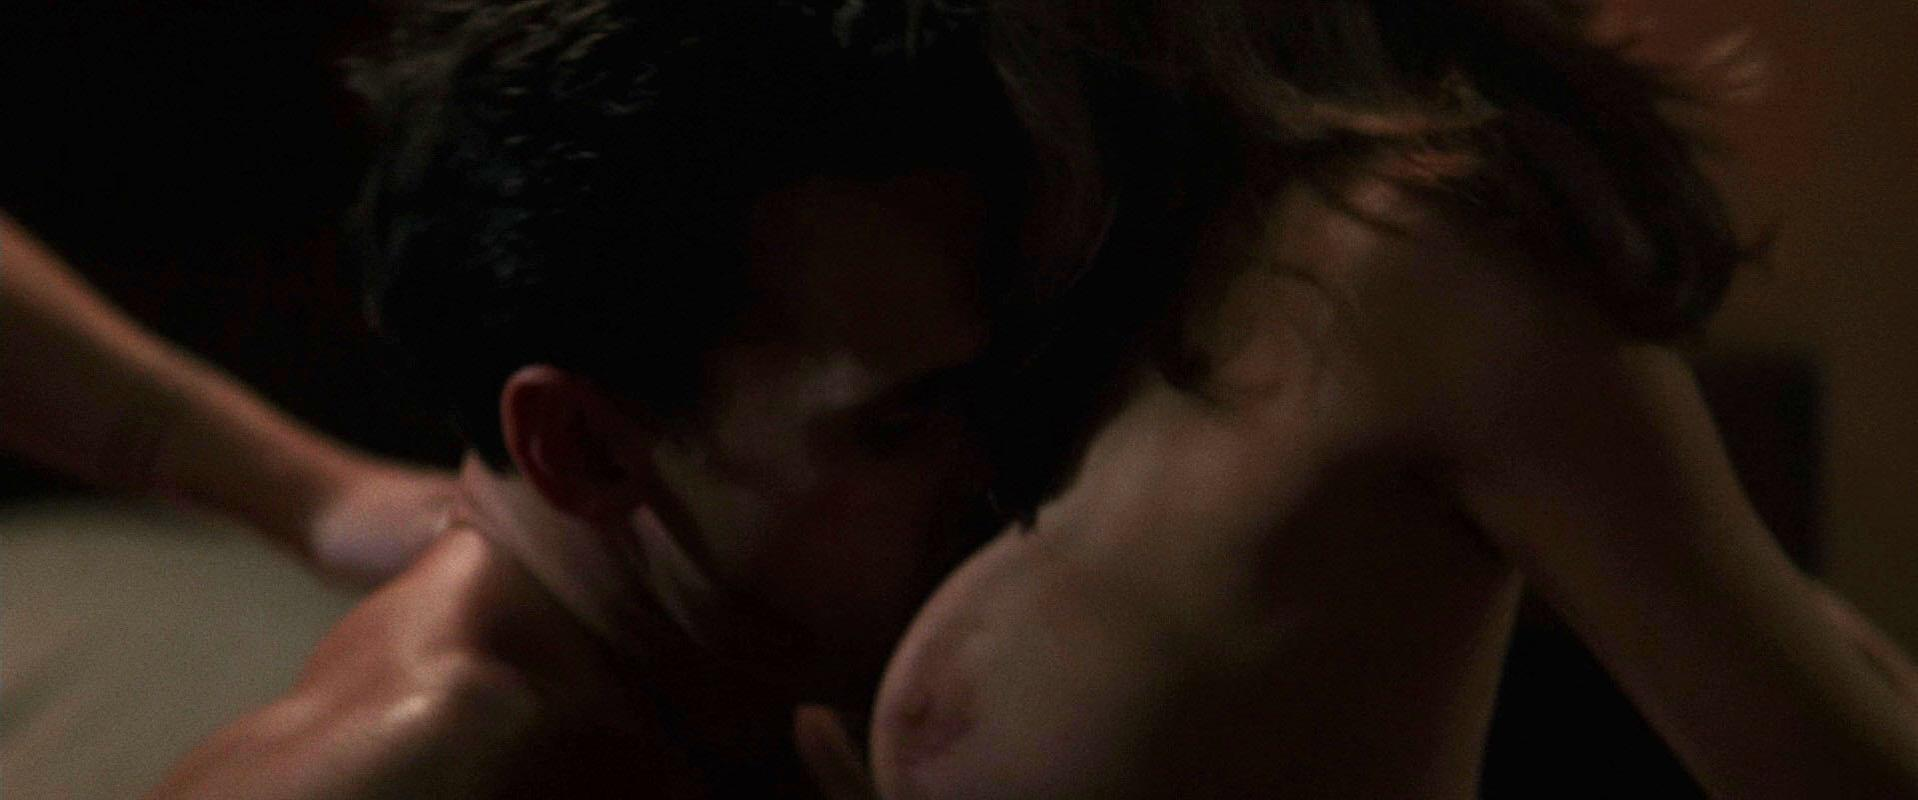 kiss scene nude girls